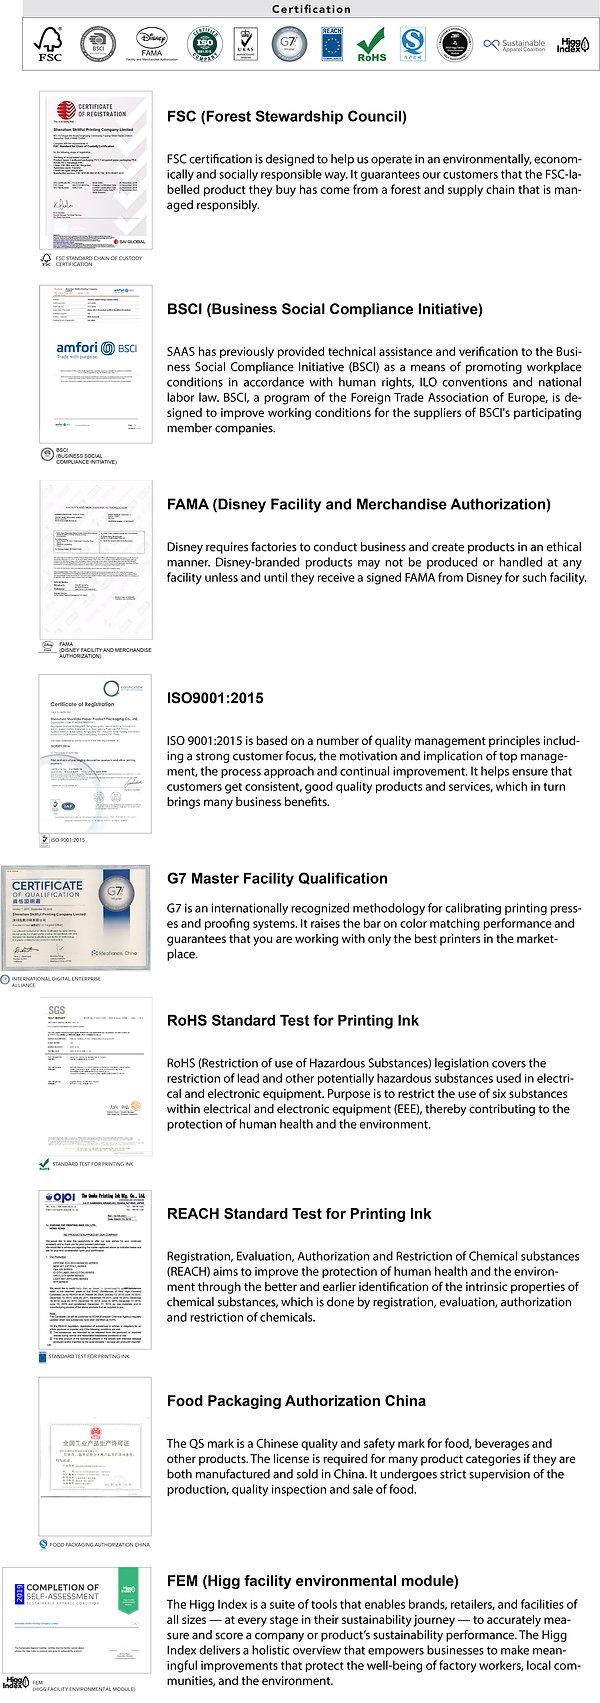 Certification_webuse.jpg